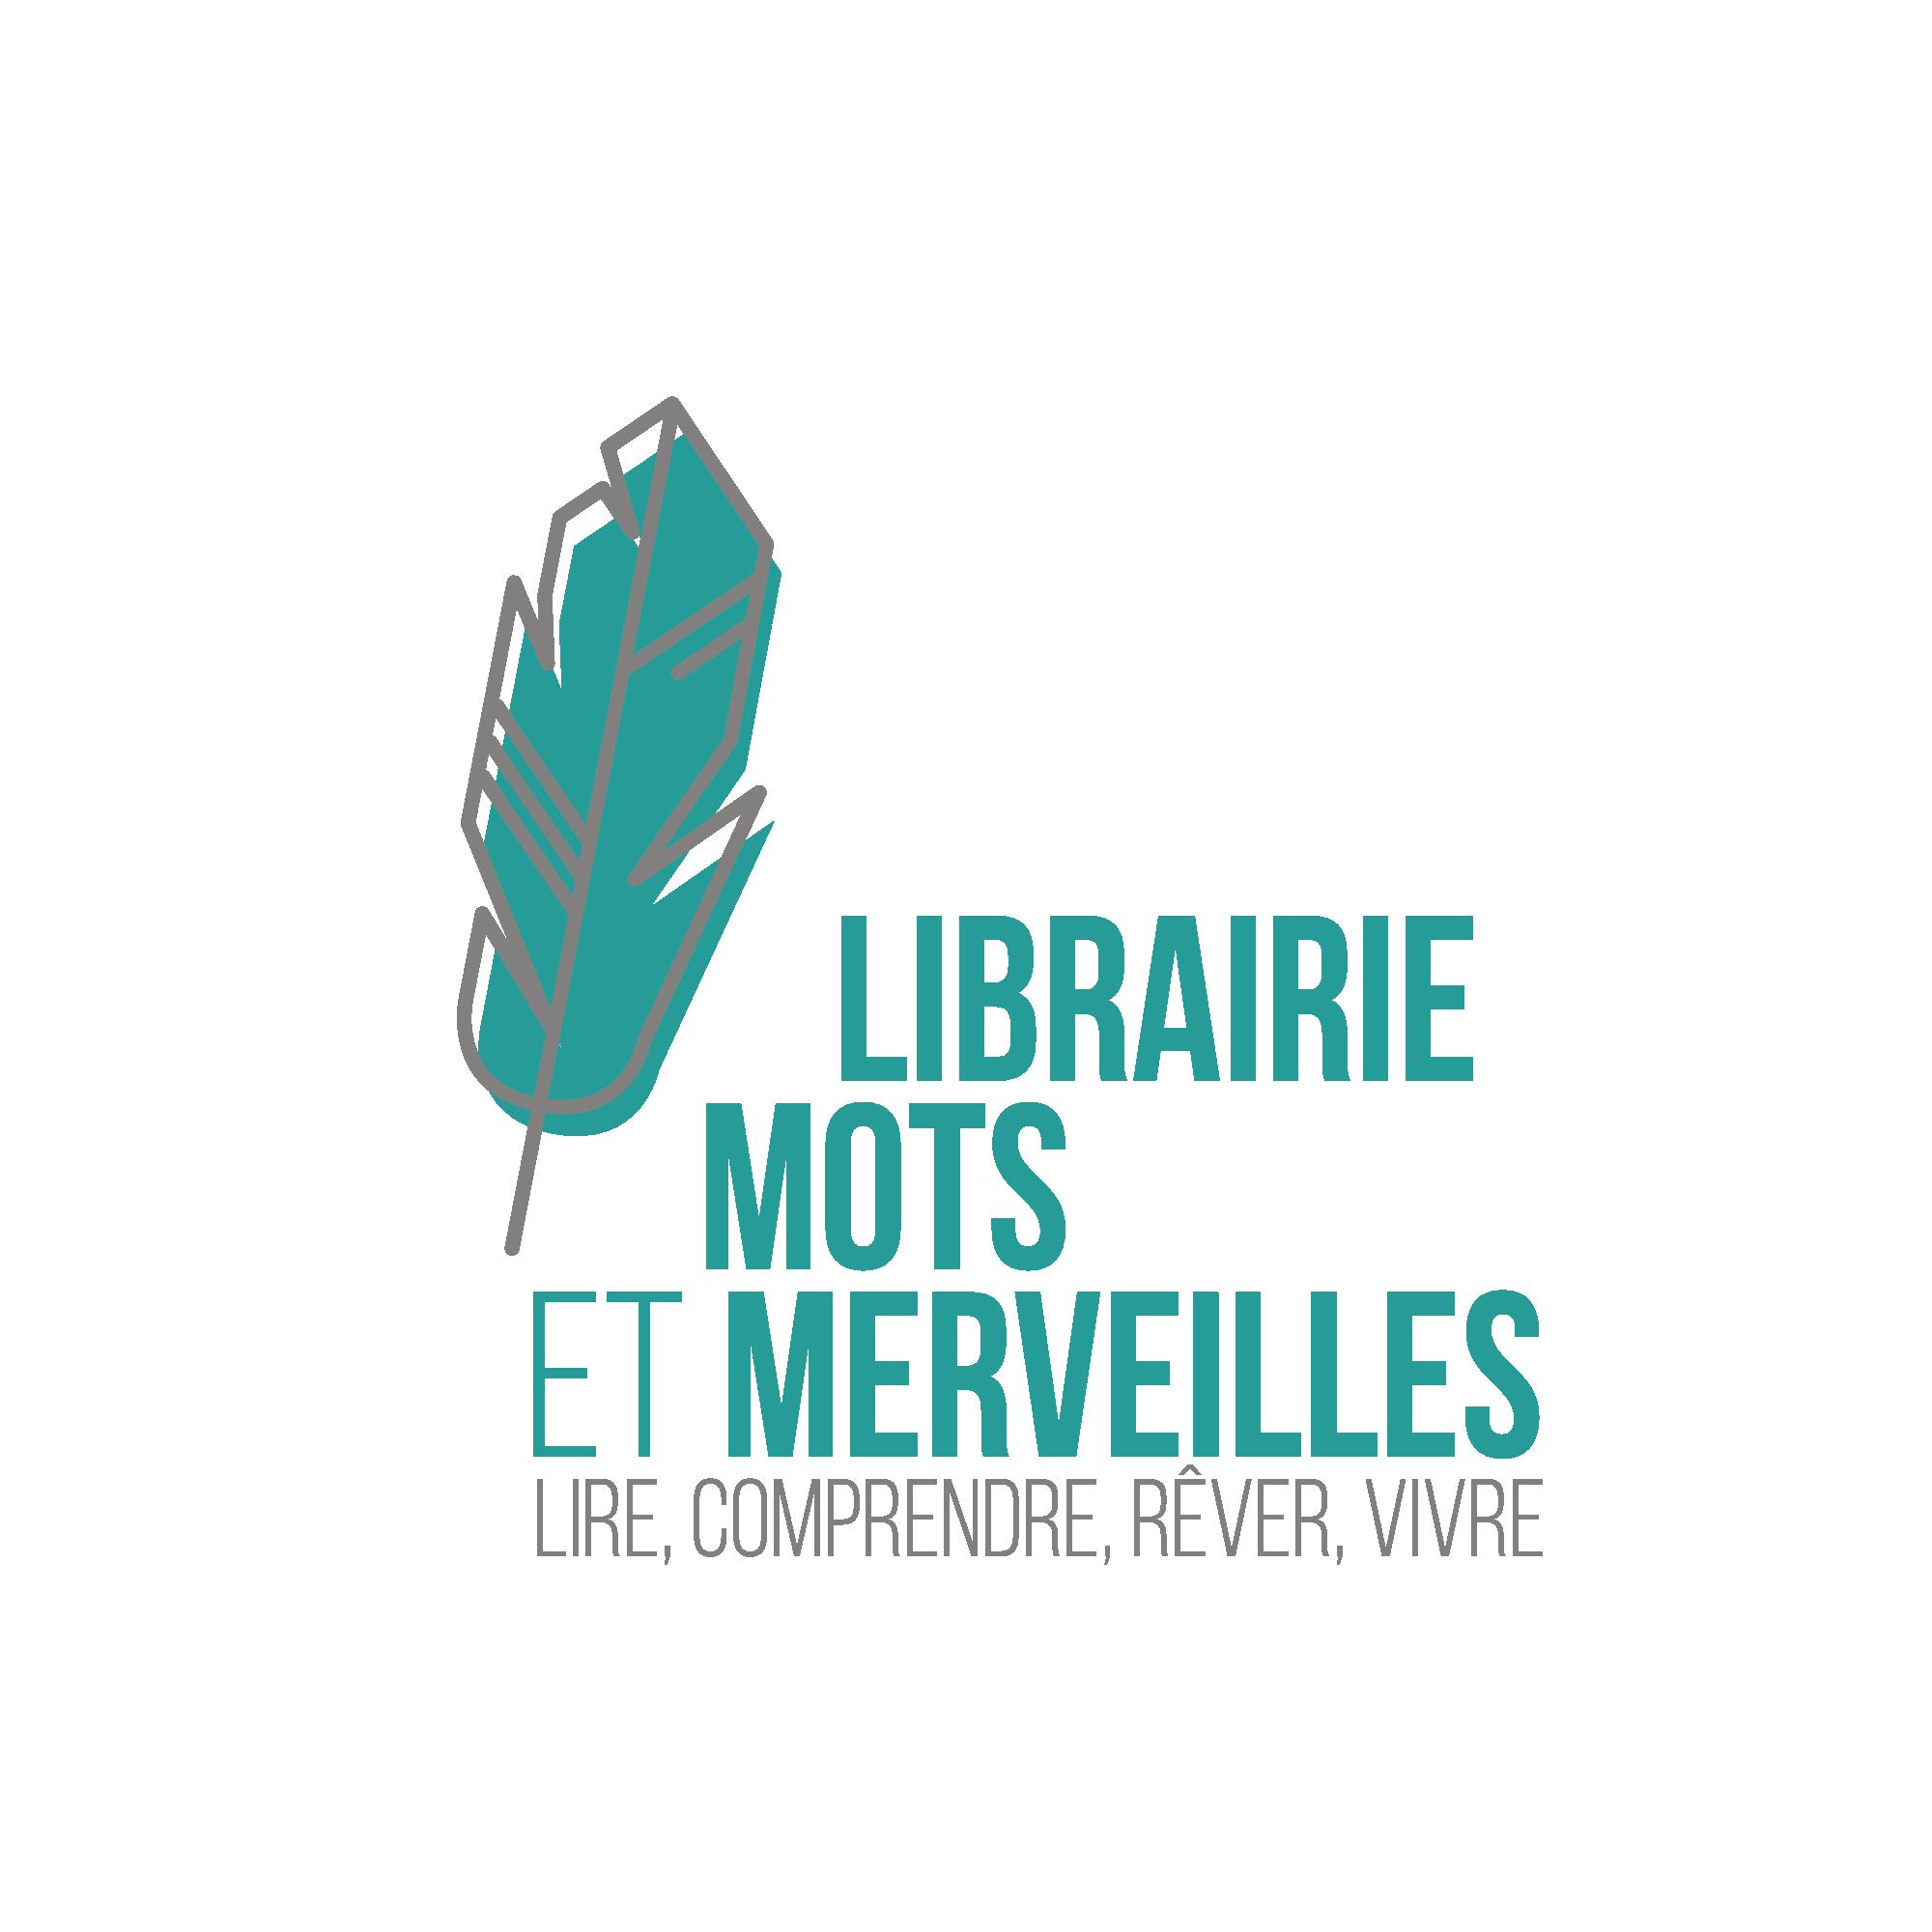 Logo librairie mots et merveilles